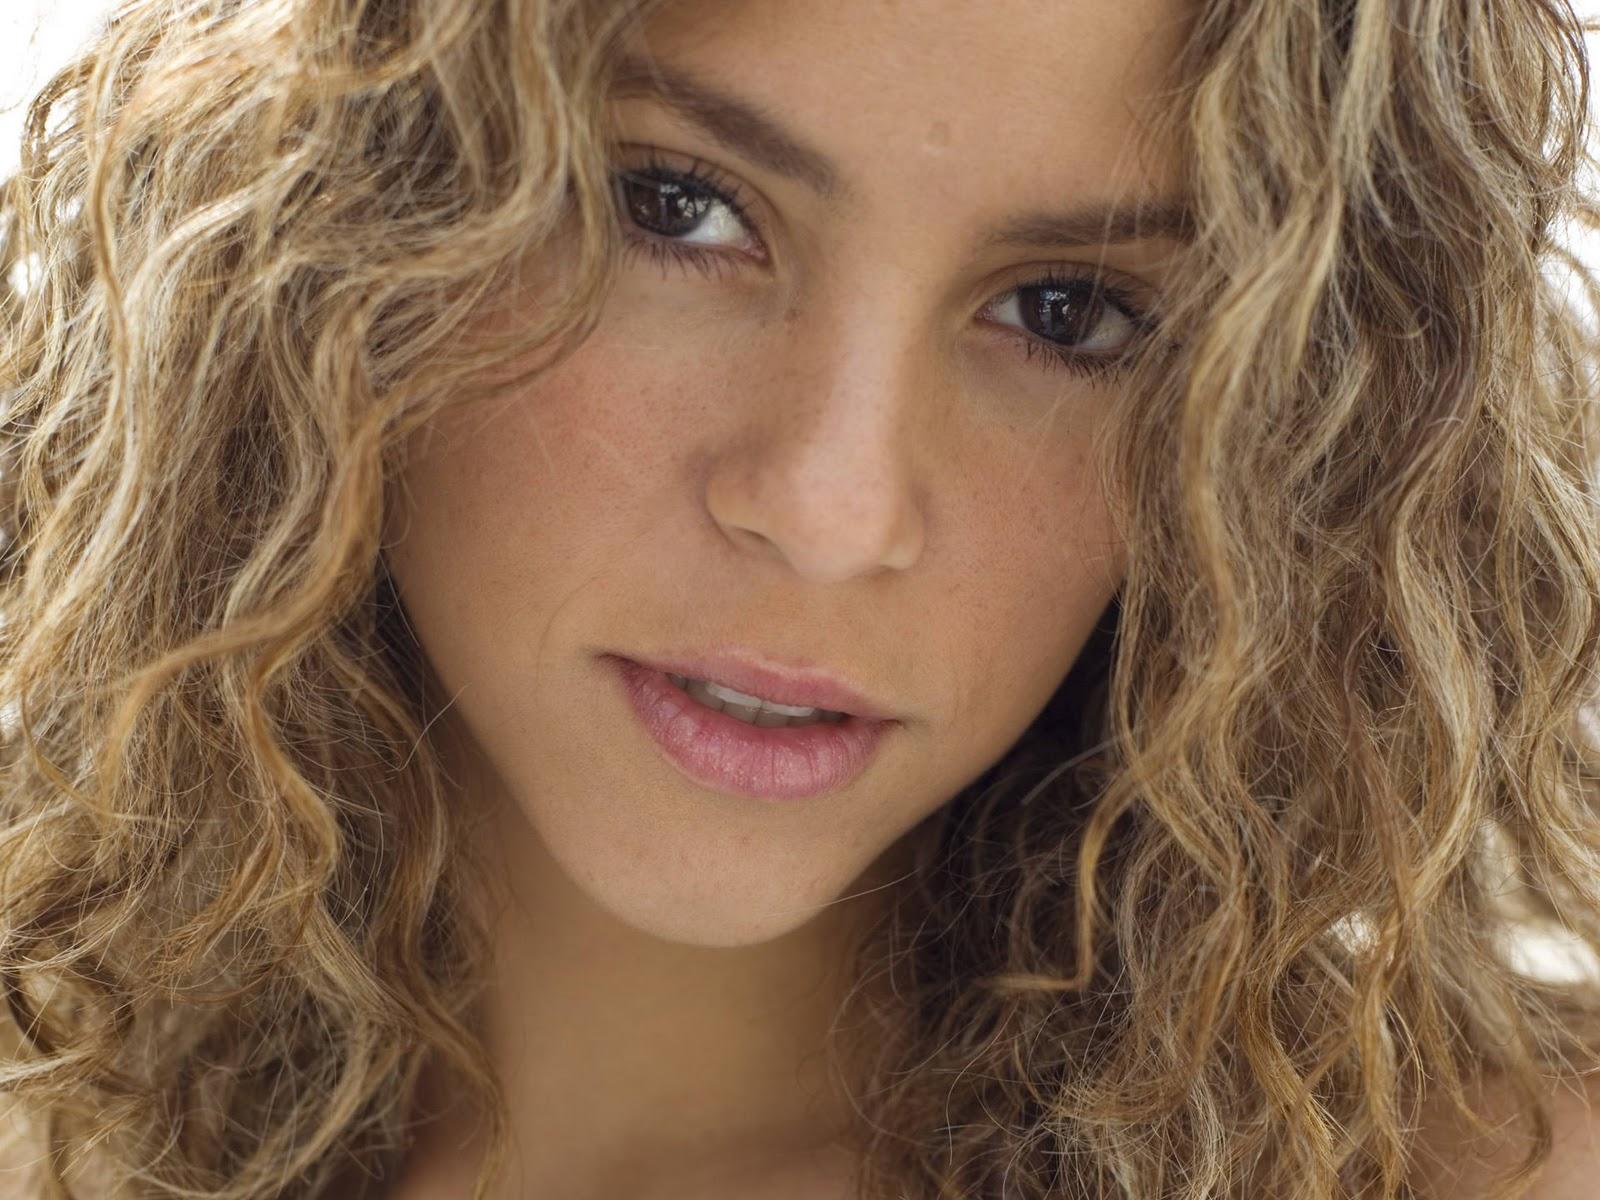 http://1.bp.blogspot.com/_8_CLn-I1Tfc/TSAf5_G-zII/AAAAAAAAALk/kY6tmK6rptE/s1600/Shakira+Mebarak+photo+shoot.jpg